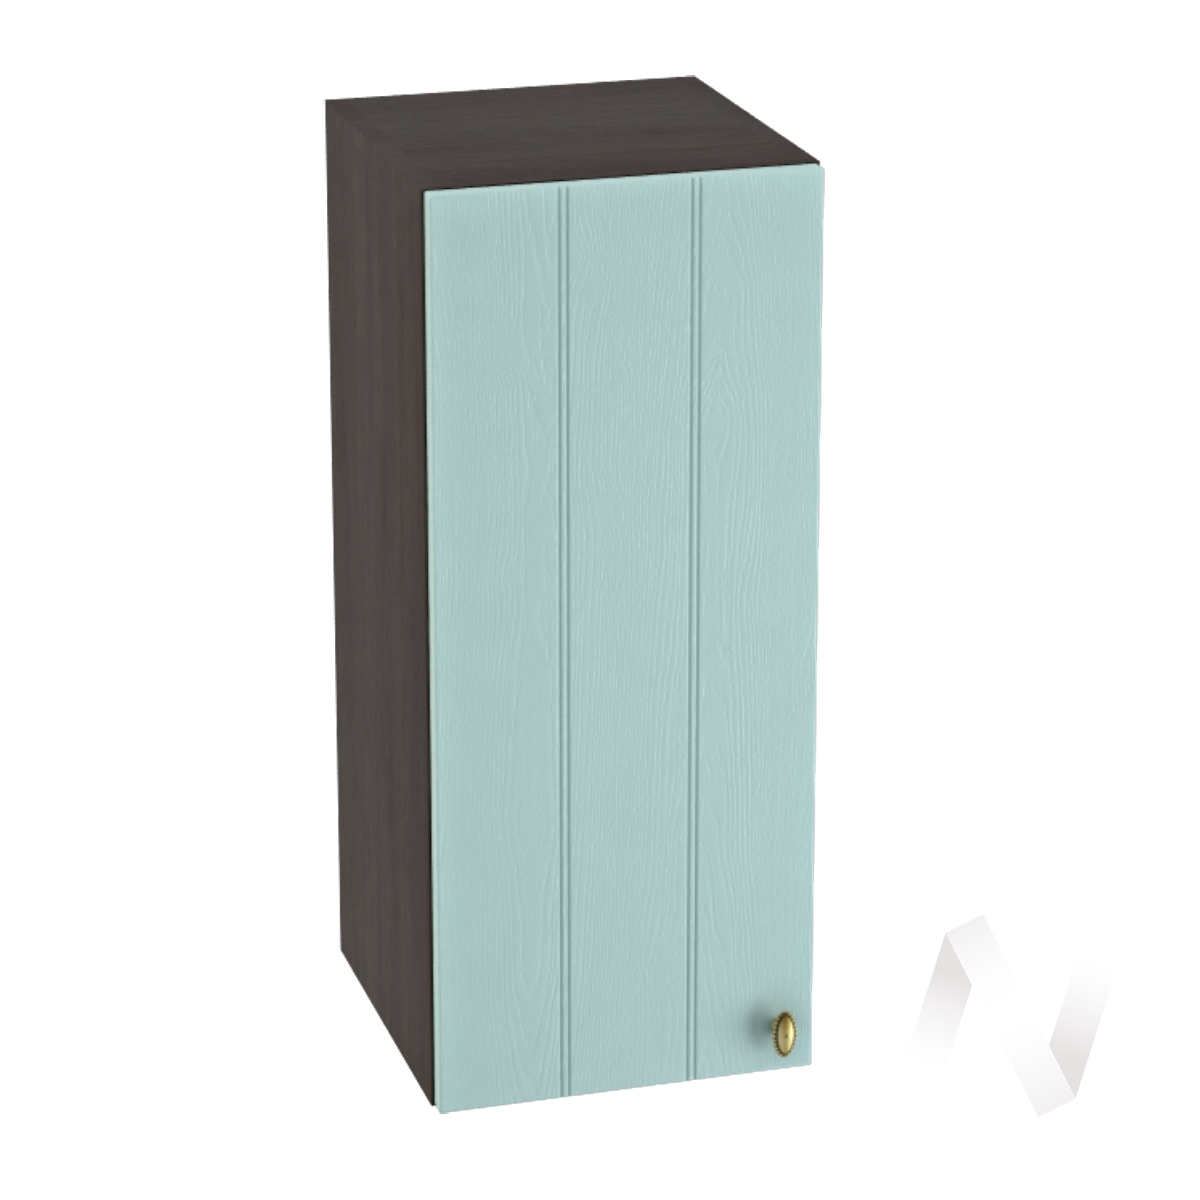 "Кухня ""Прованс"": Шкаф верхний 300, ШВ 300 (голубой/корпус венге)"